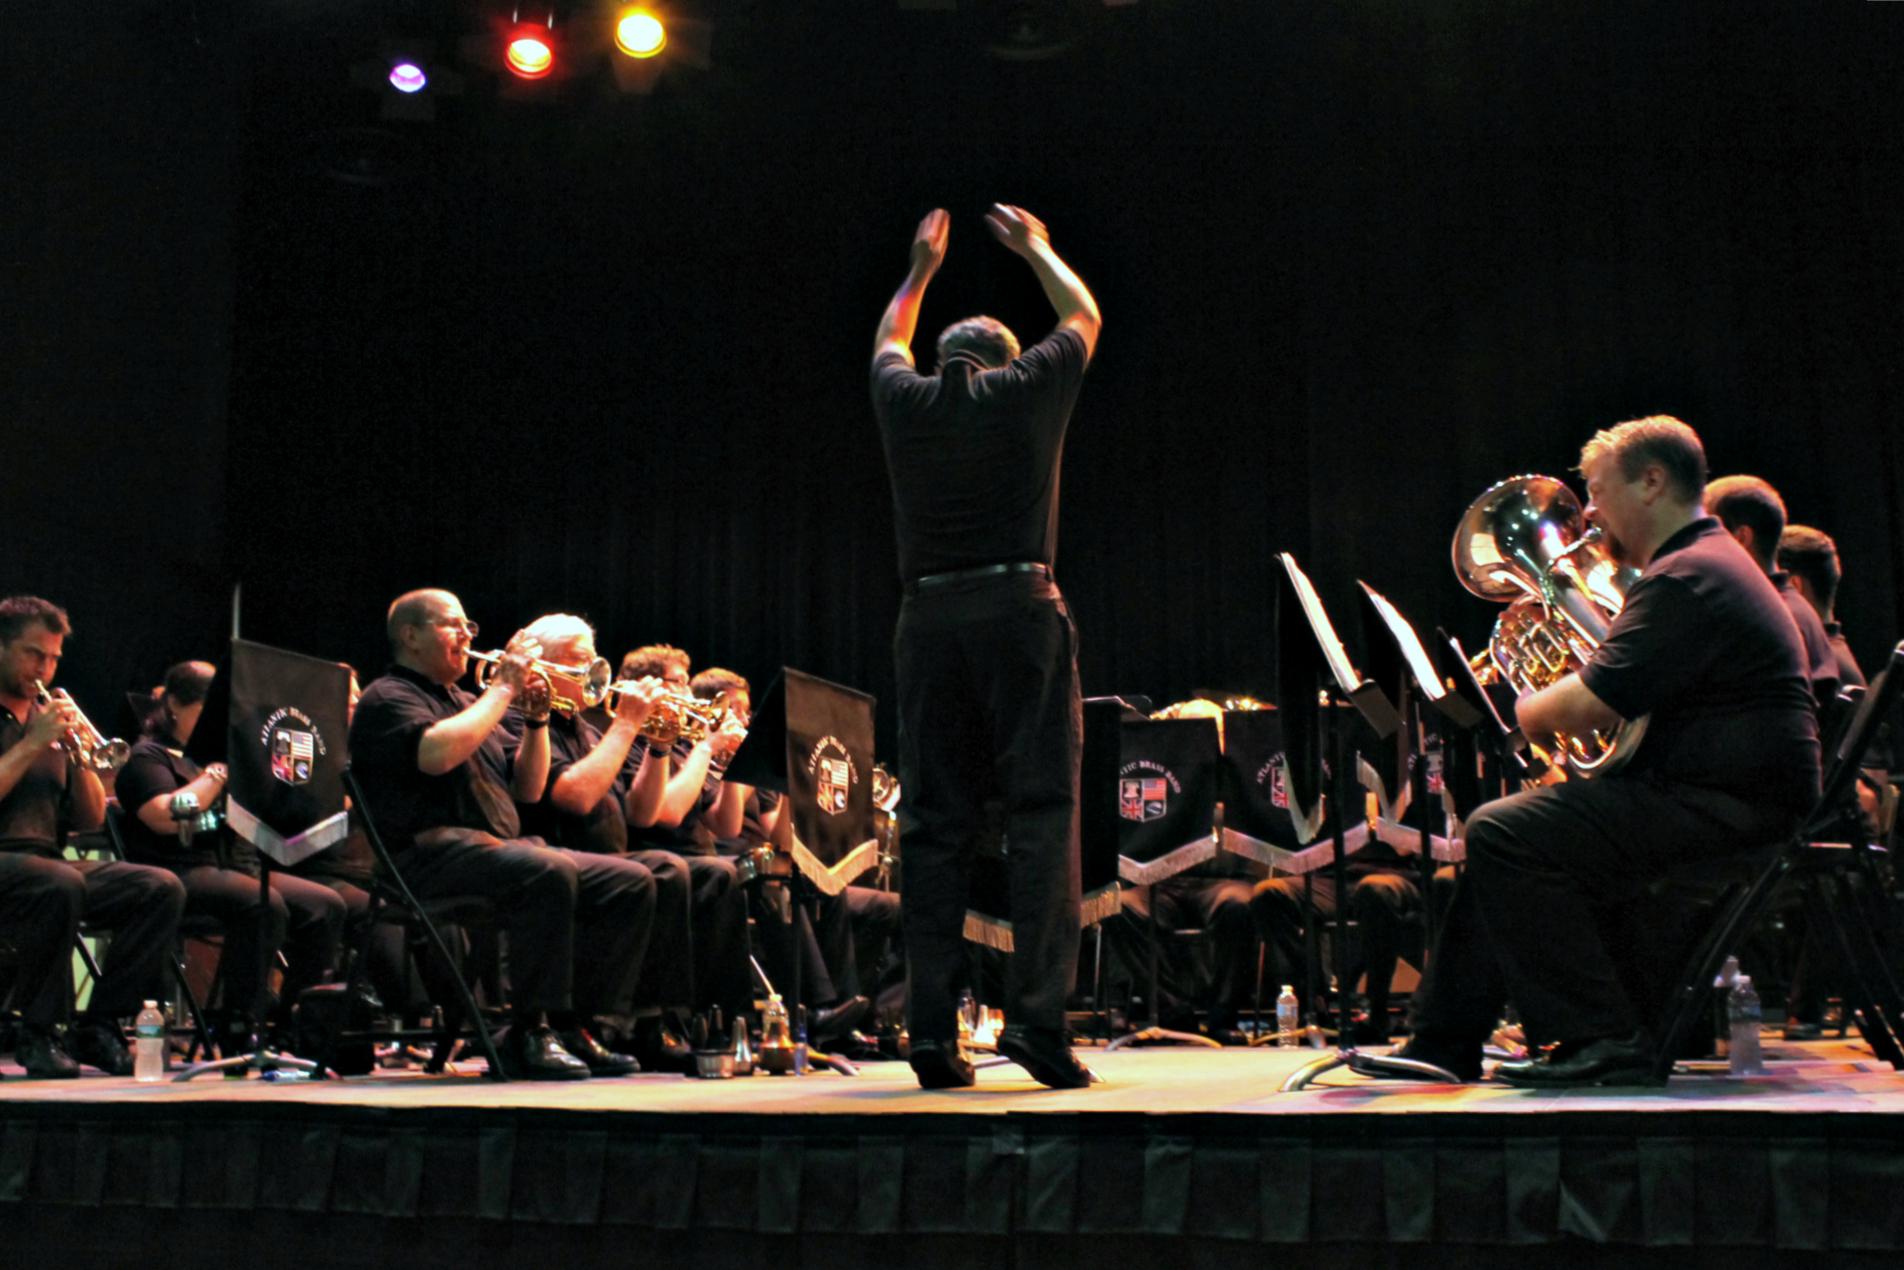 Cape May Music Festival